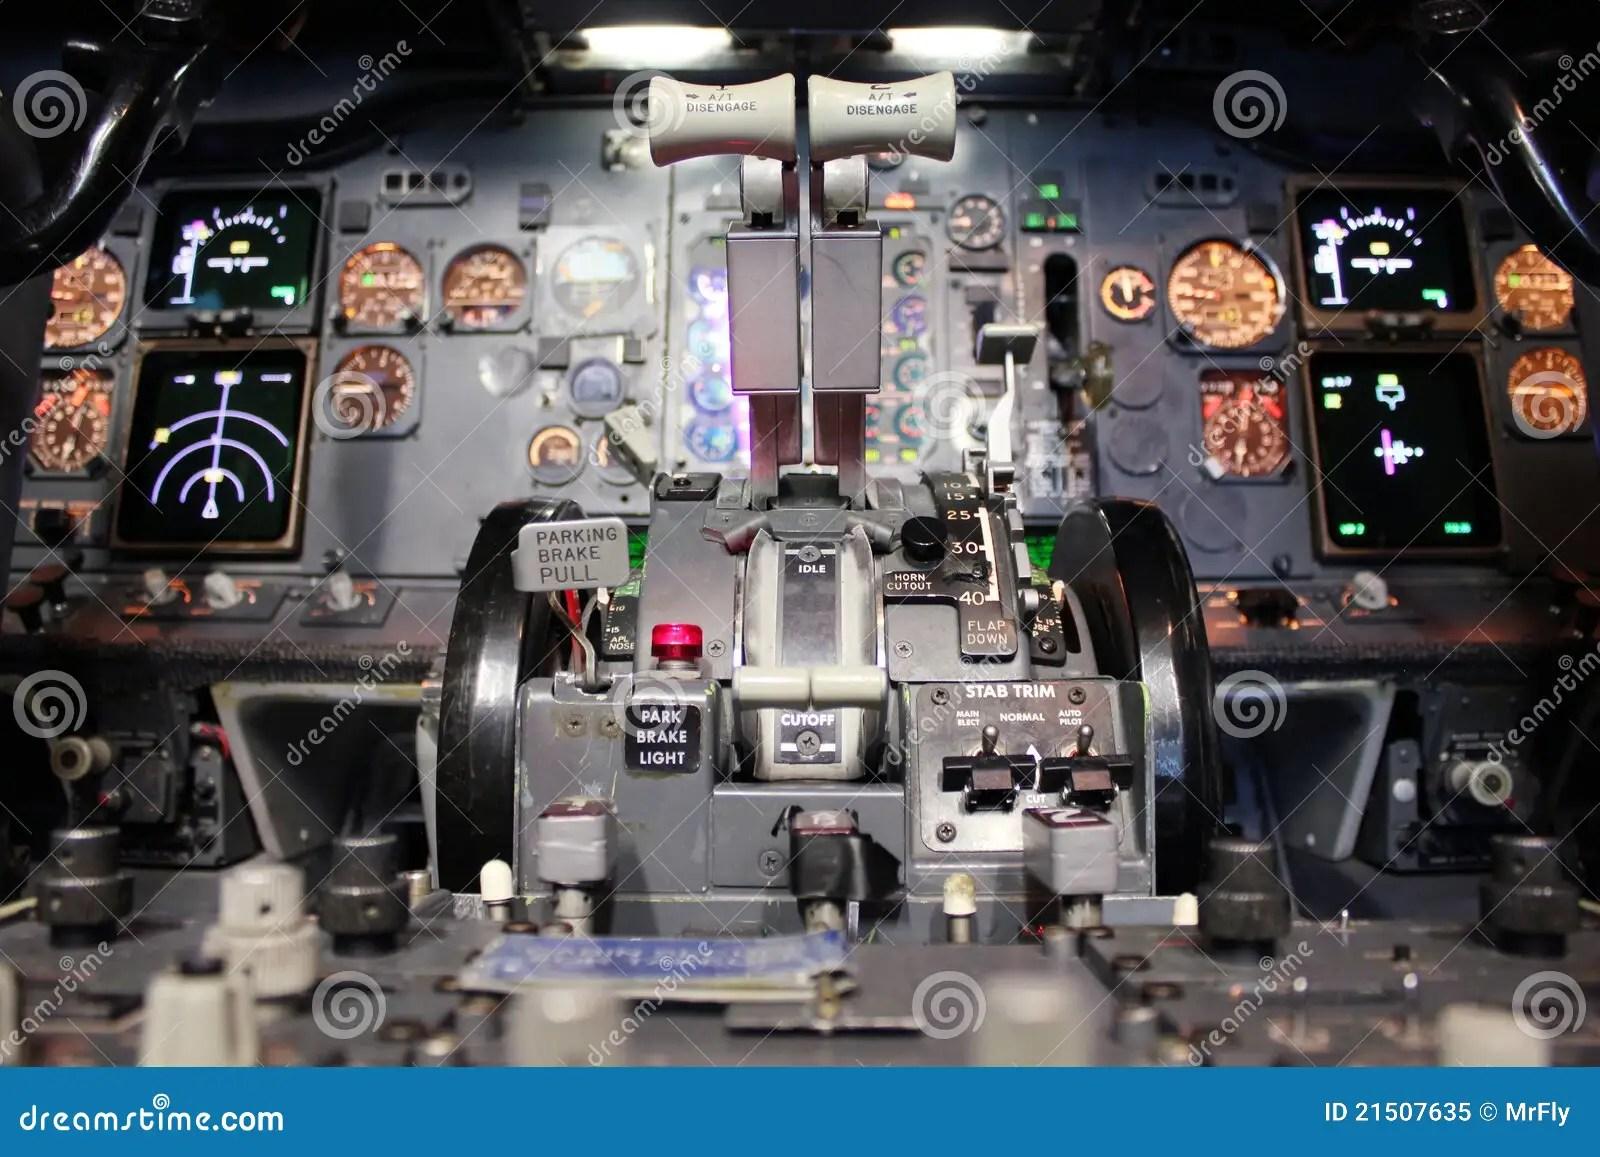 Boeing 737 Flight Deck Stock Image Image Of Deck